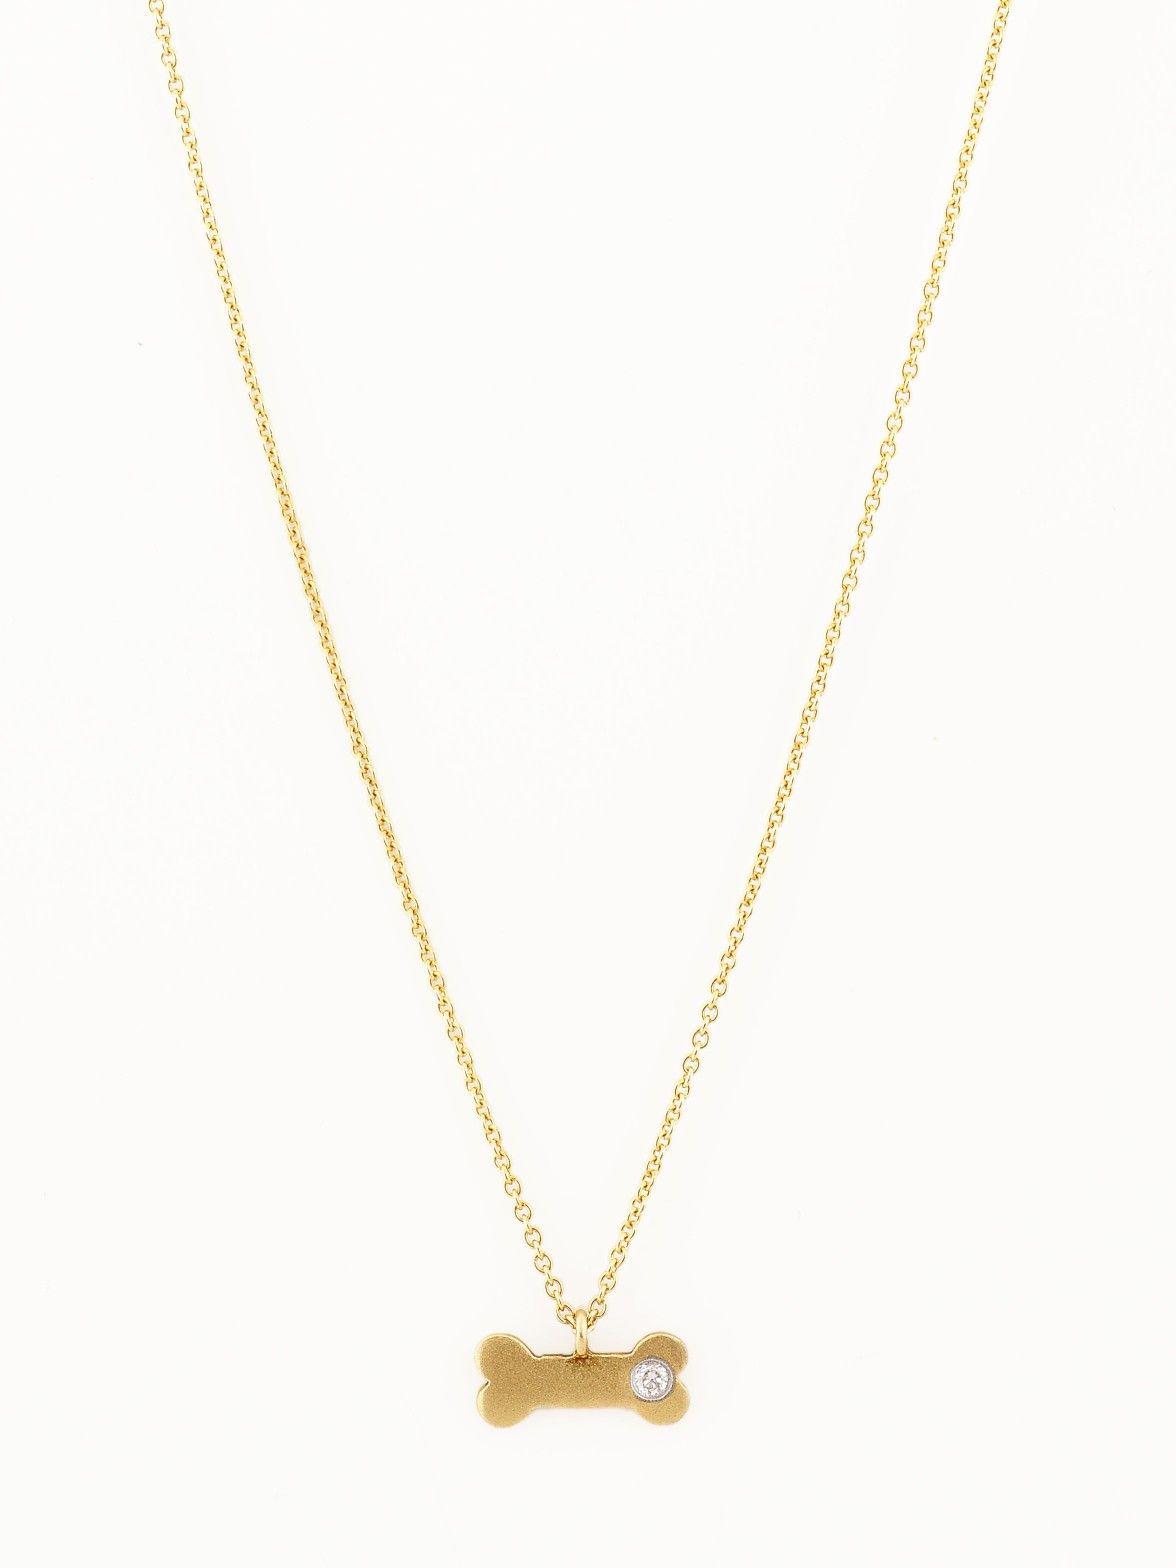 Meira t 14k dog bone pendant necklacedukes name engraved and the meira t 14k dog bone pendant necklacedukes name engraved and the year we got him 3 aloadofball Gallery